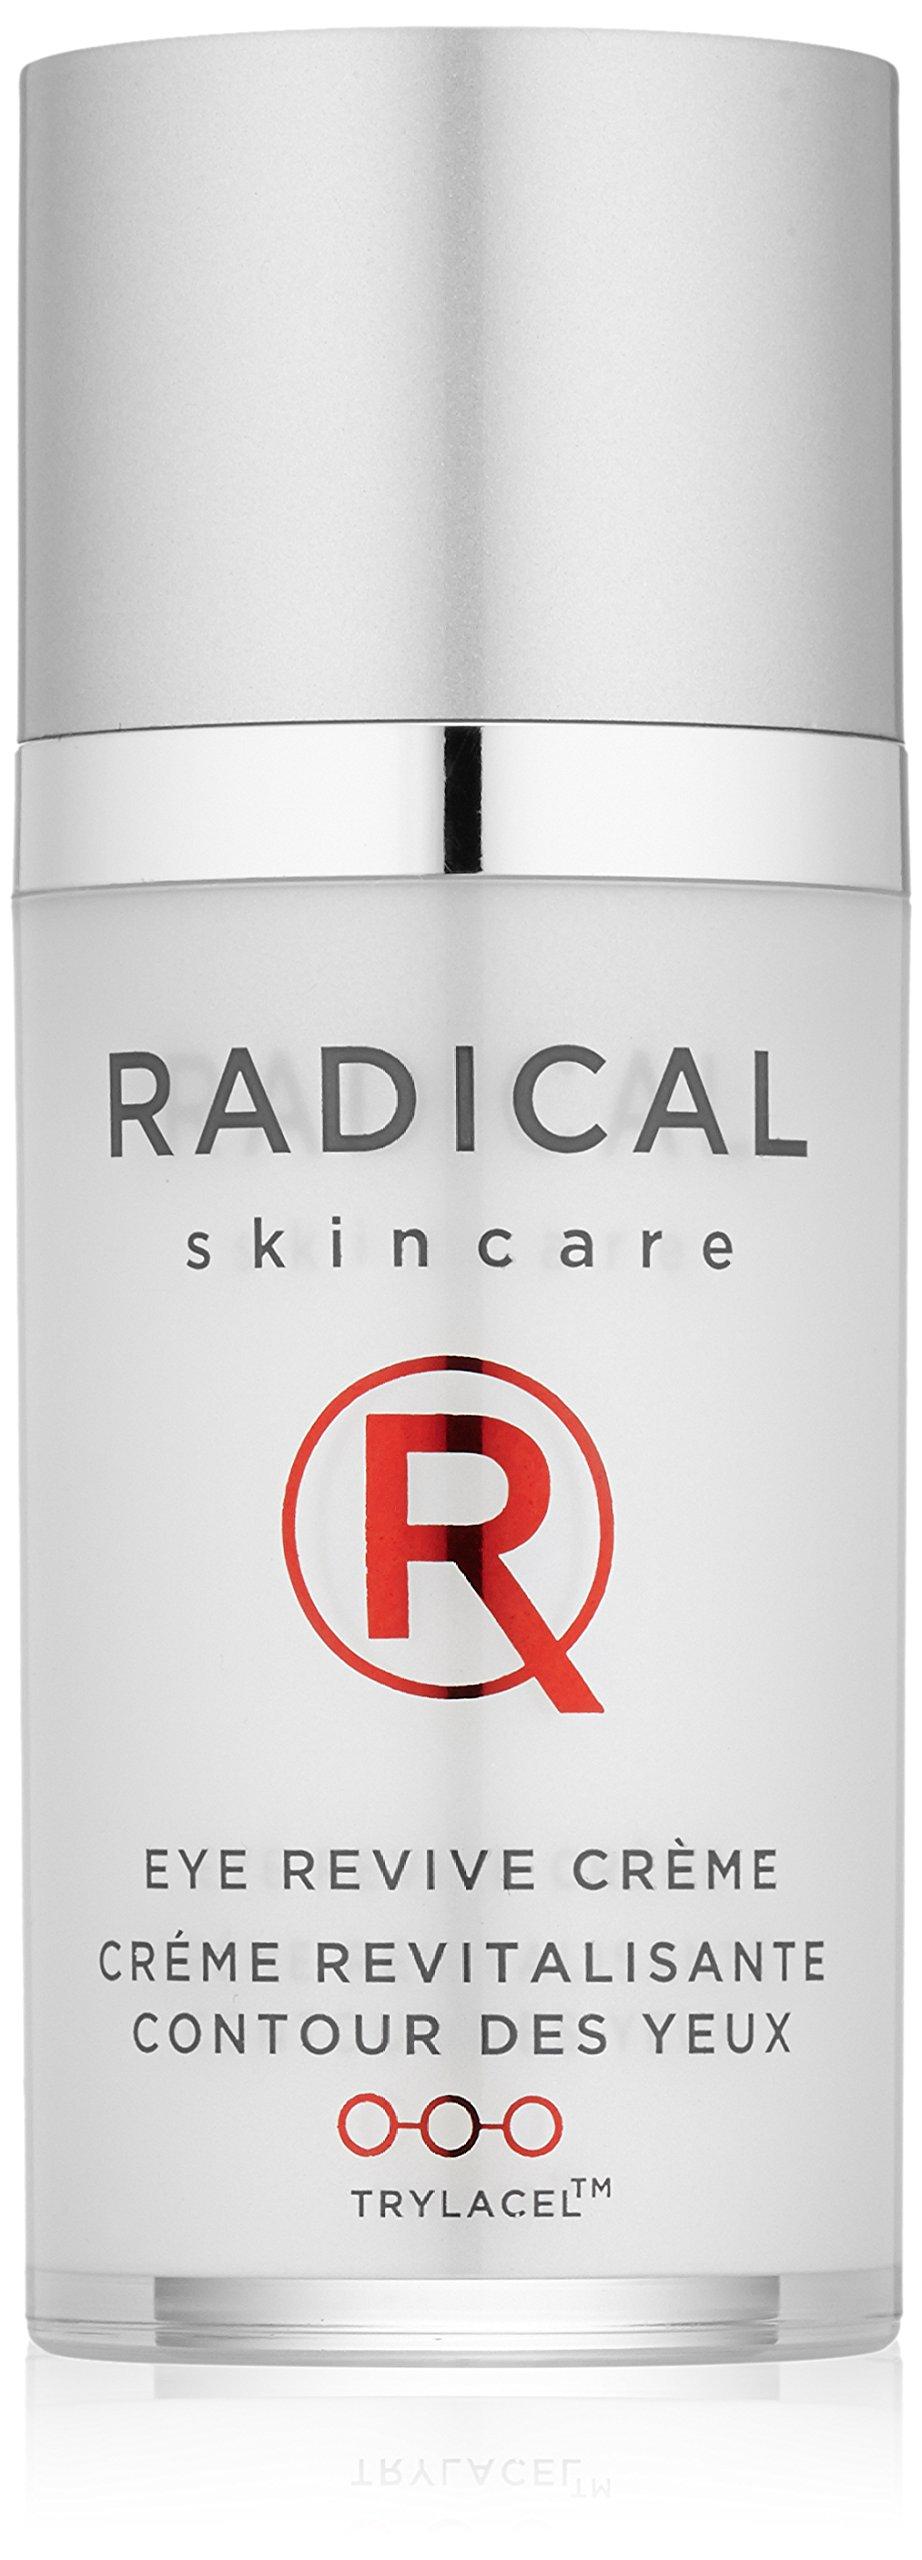 Radical Skincare Eye Revive Creme, 0.5 Fl Oz